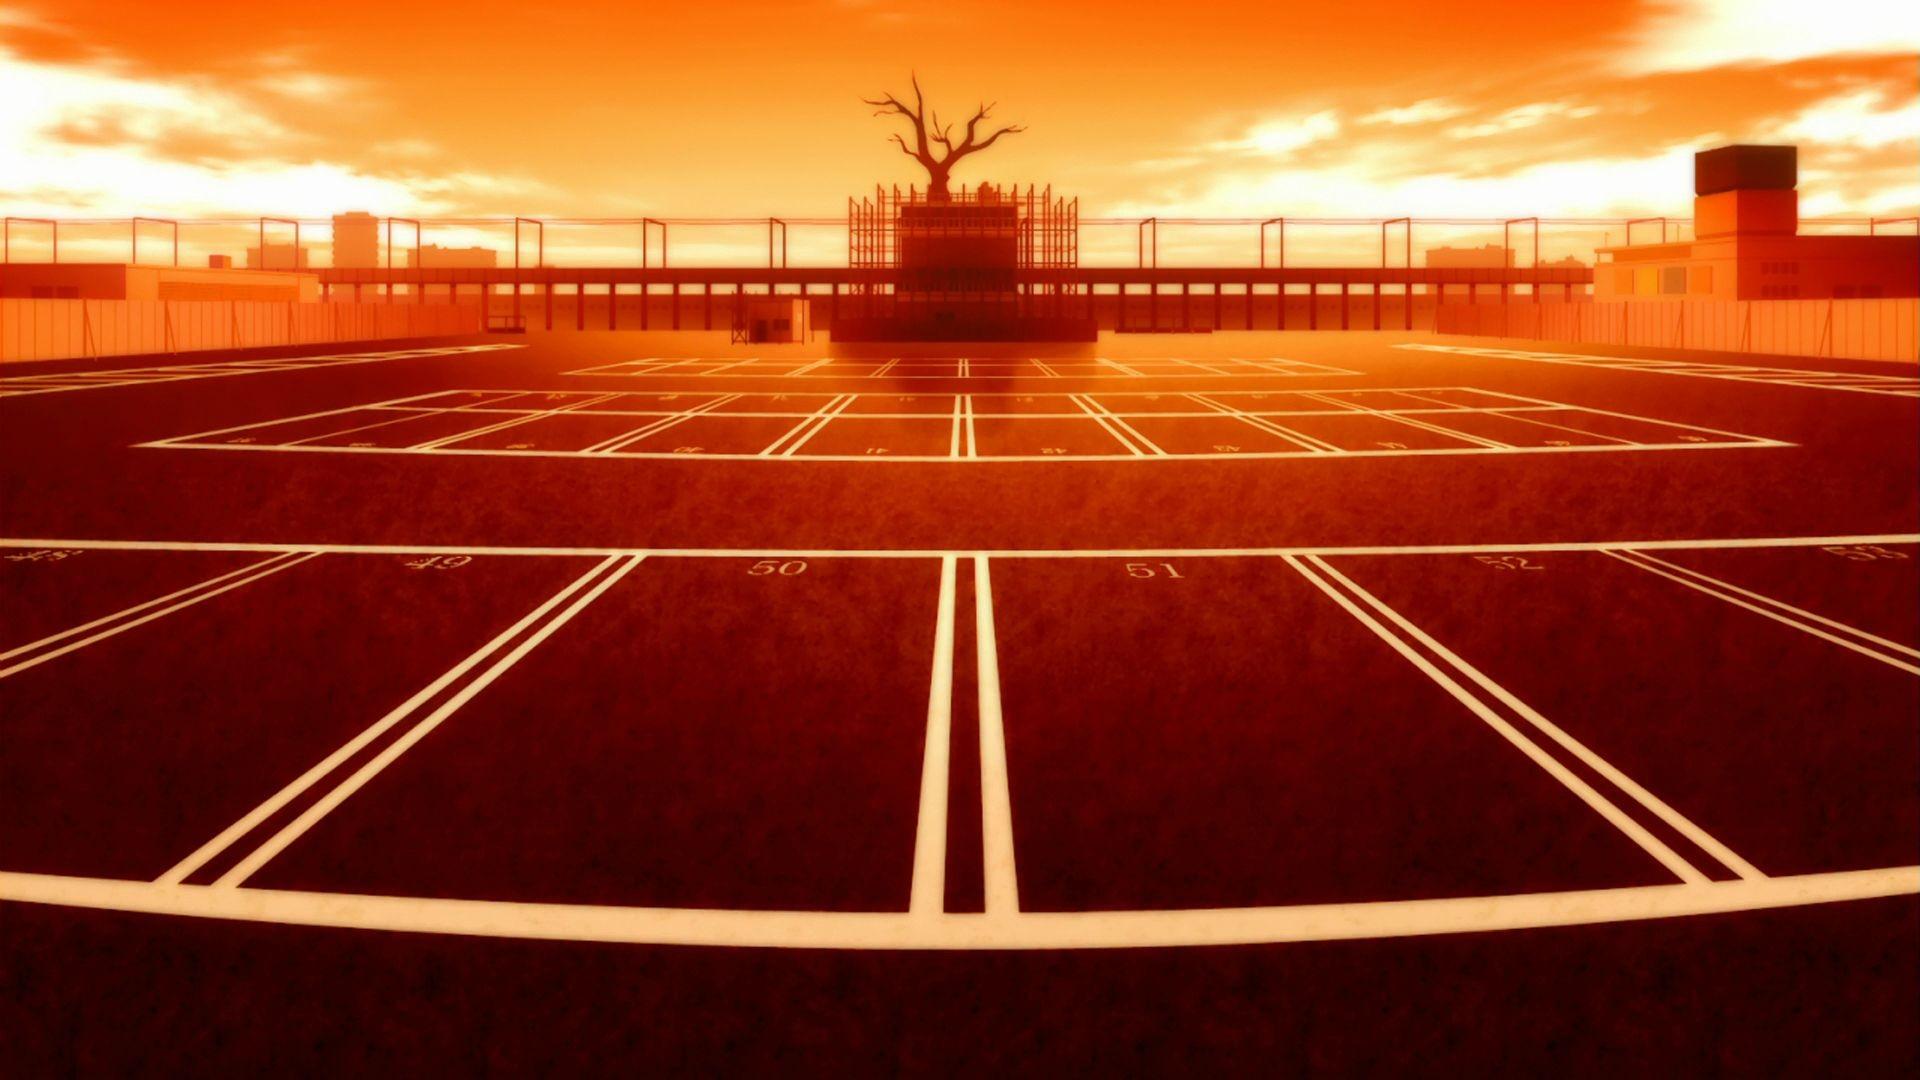 Wallpaper monogatari series anime tennis court - Court wallpaper ...